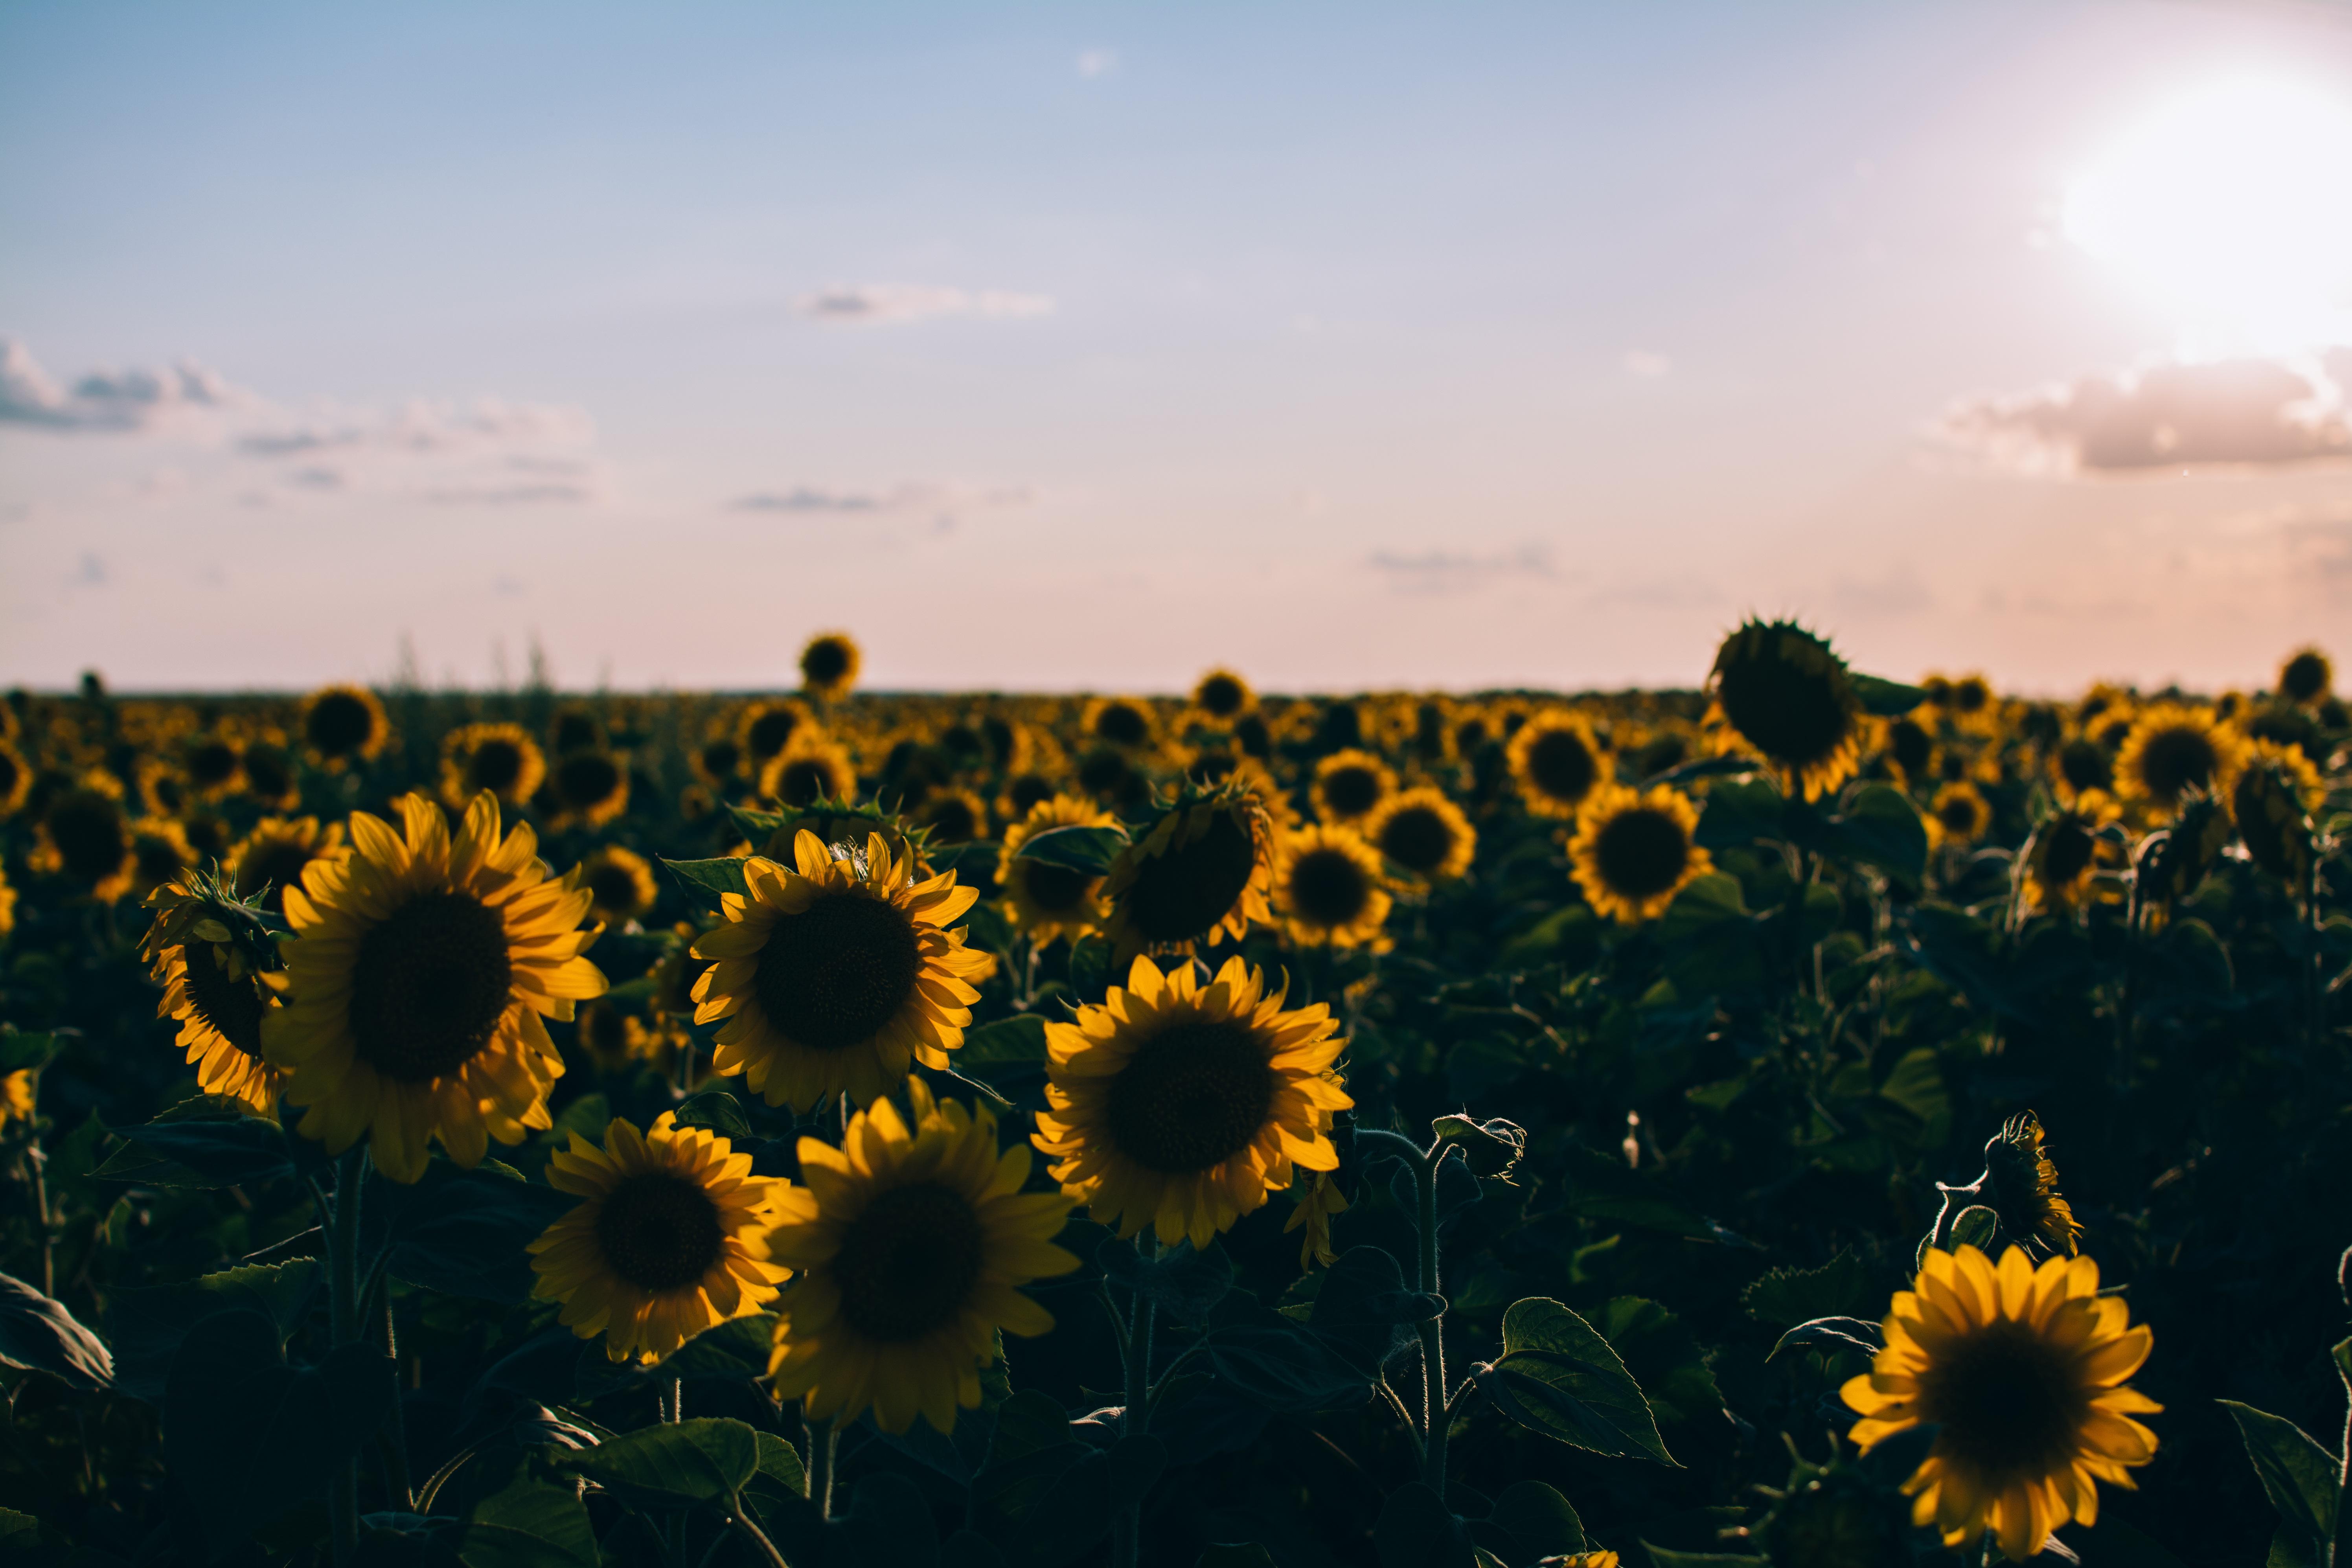 Field of sunflowers, sunflower, field, flower, yellow